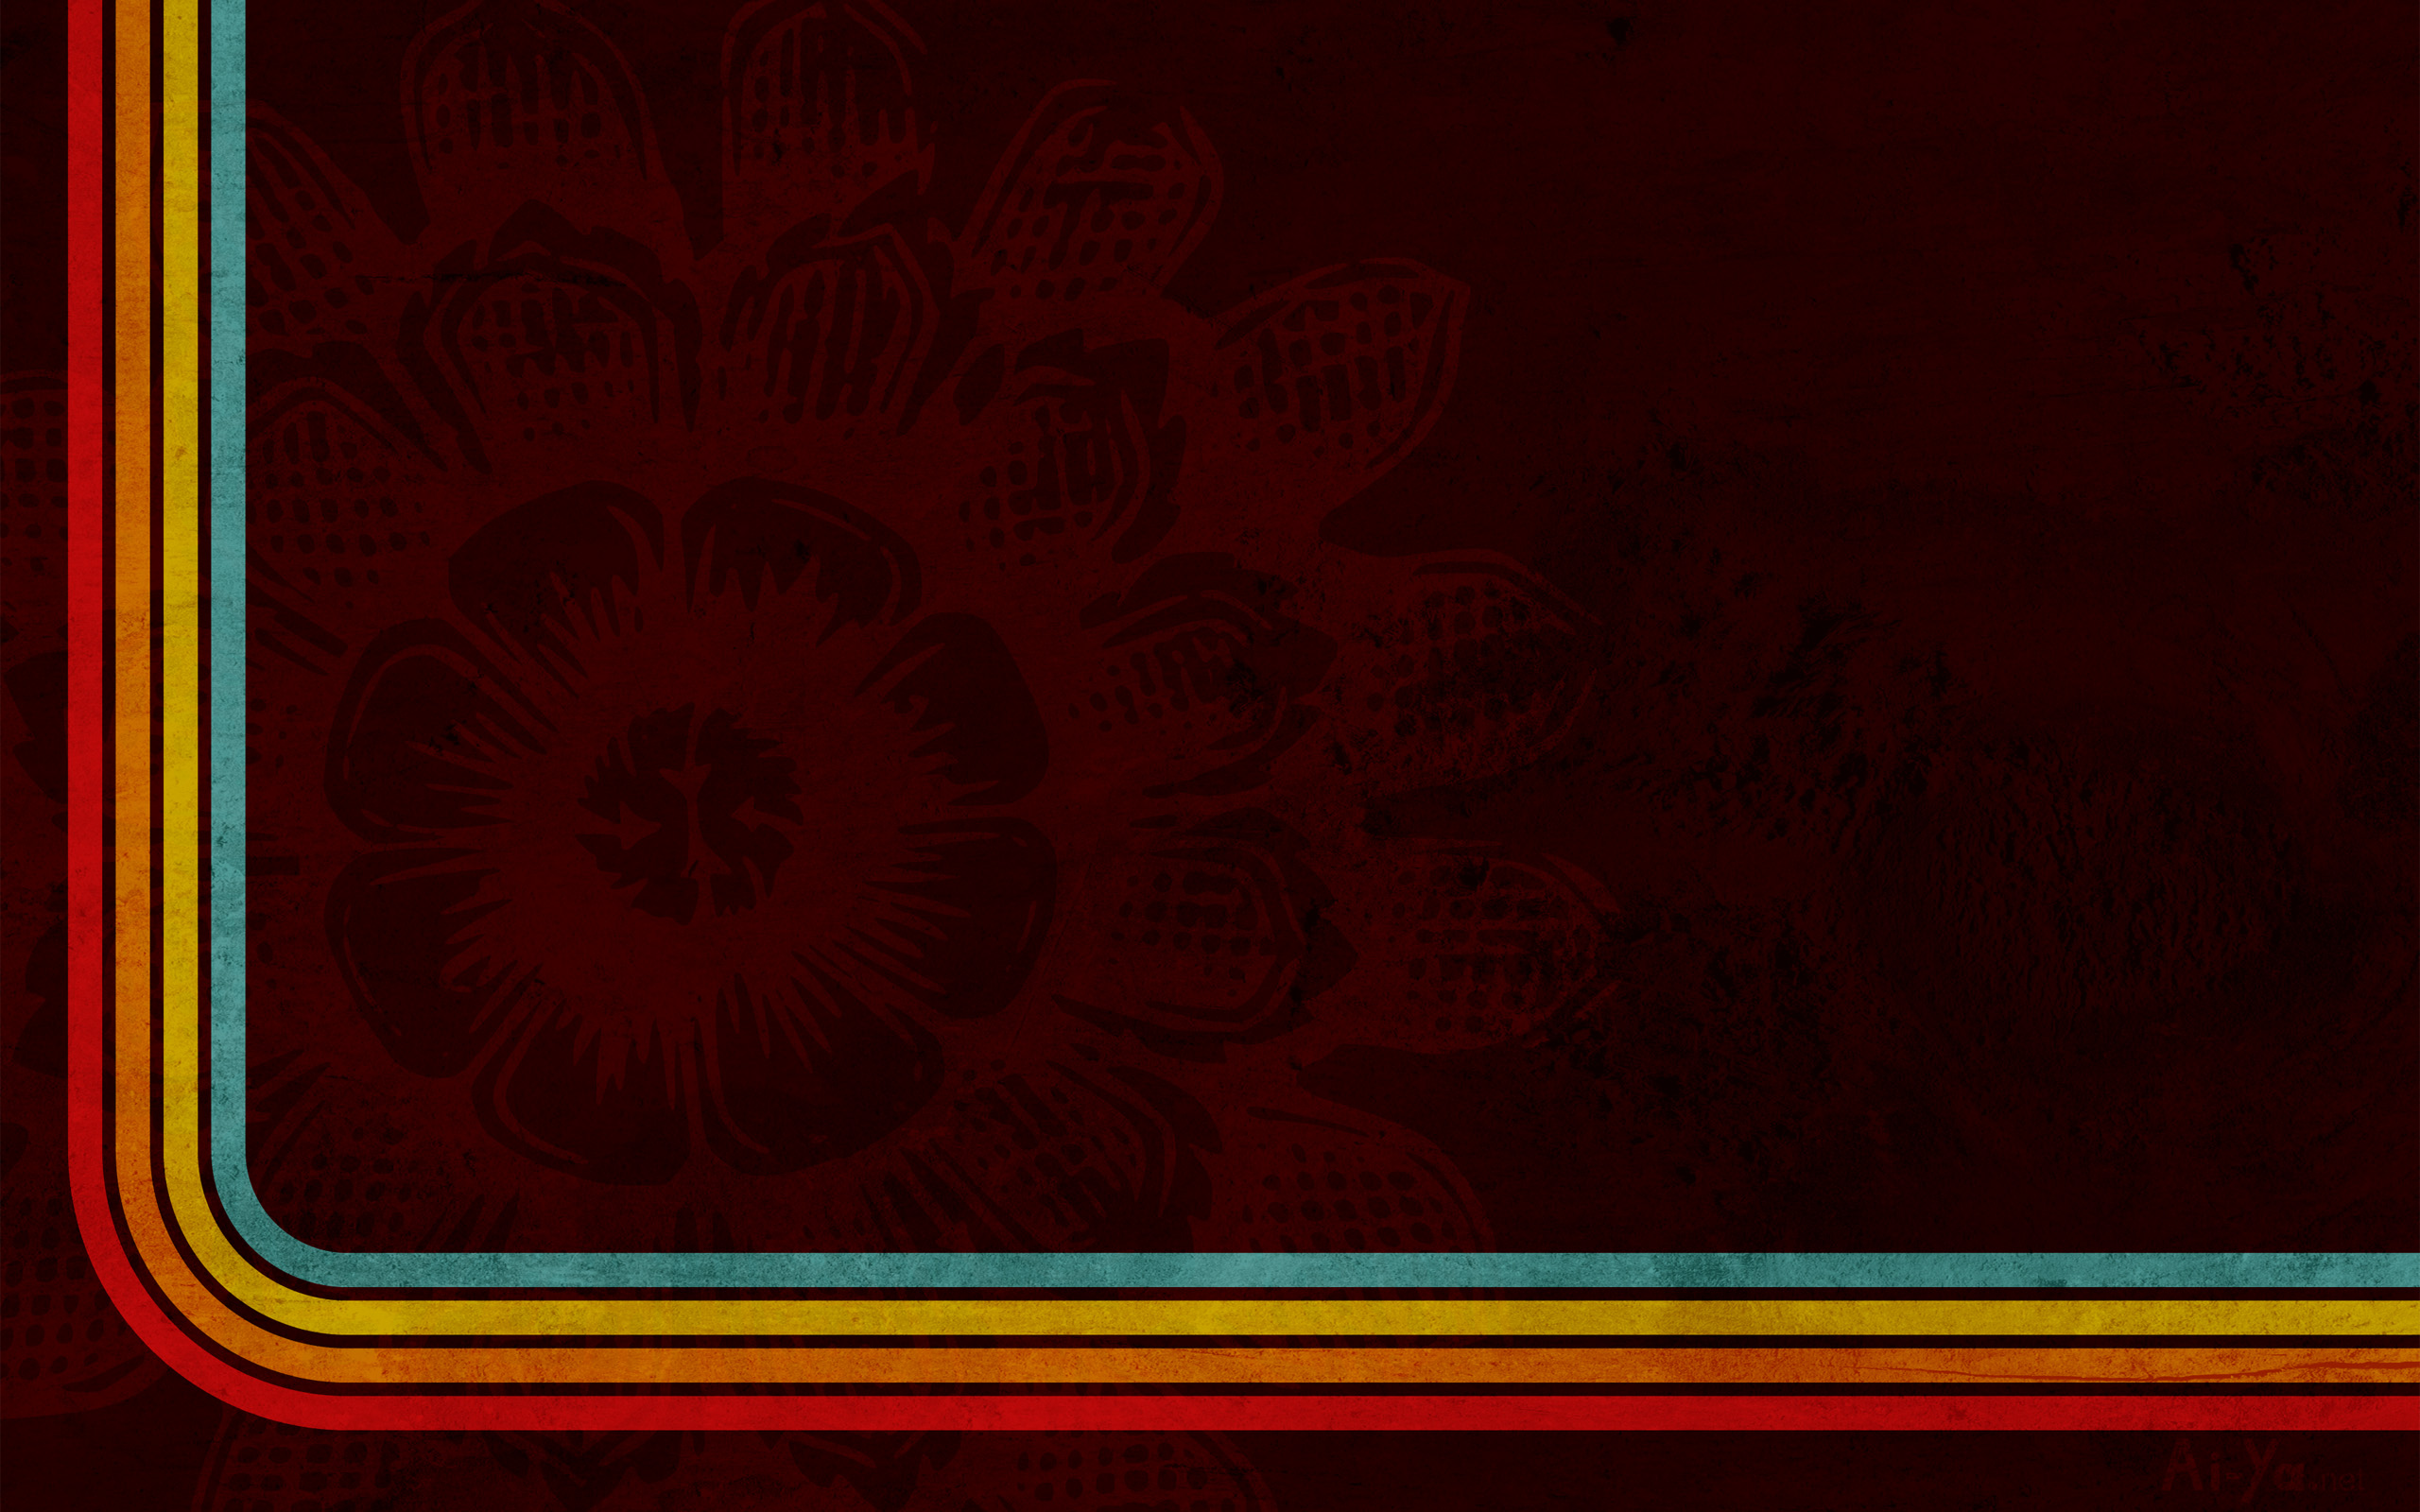 Eastern Flower Retro Stripes wallpapers Eastern Flower Retro 2560x1600